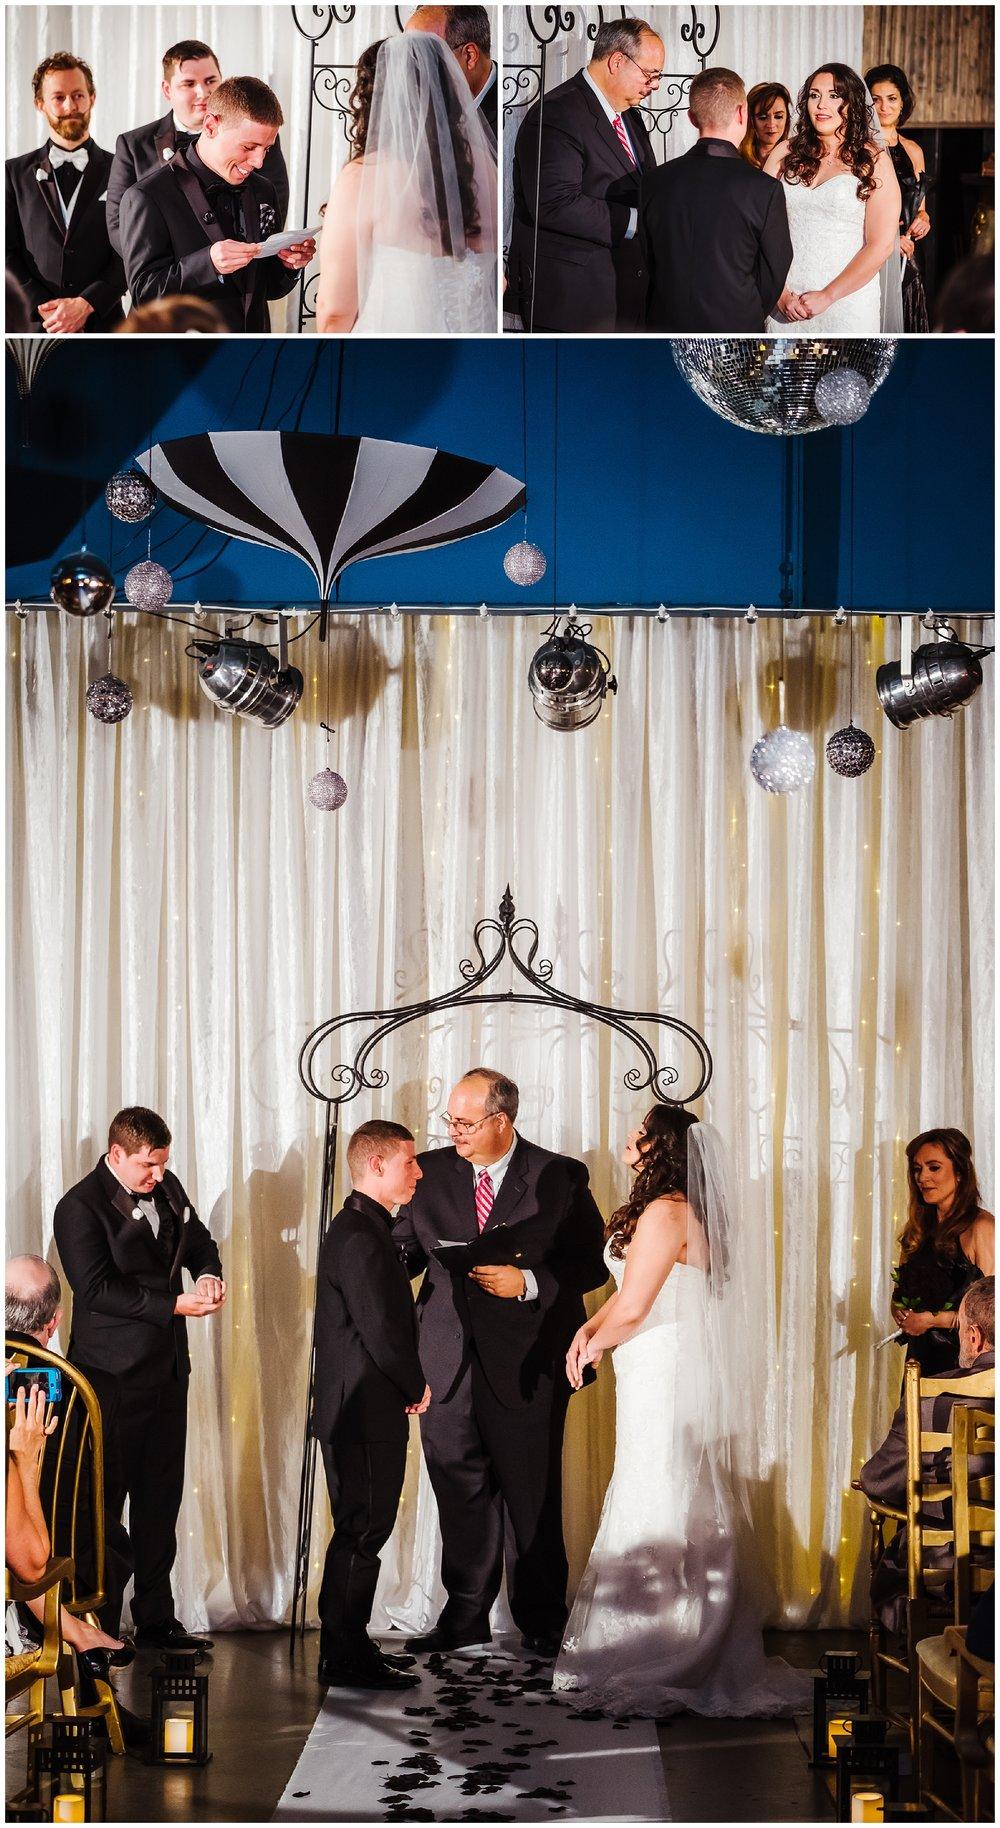 tampa-wedding-photographer-unique-indoor-venue_0026.jpg